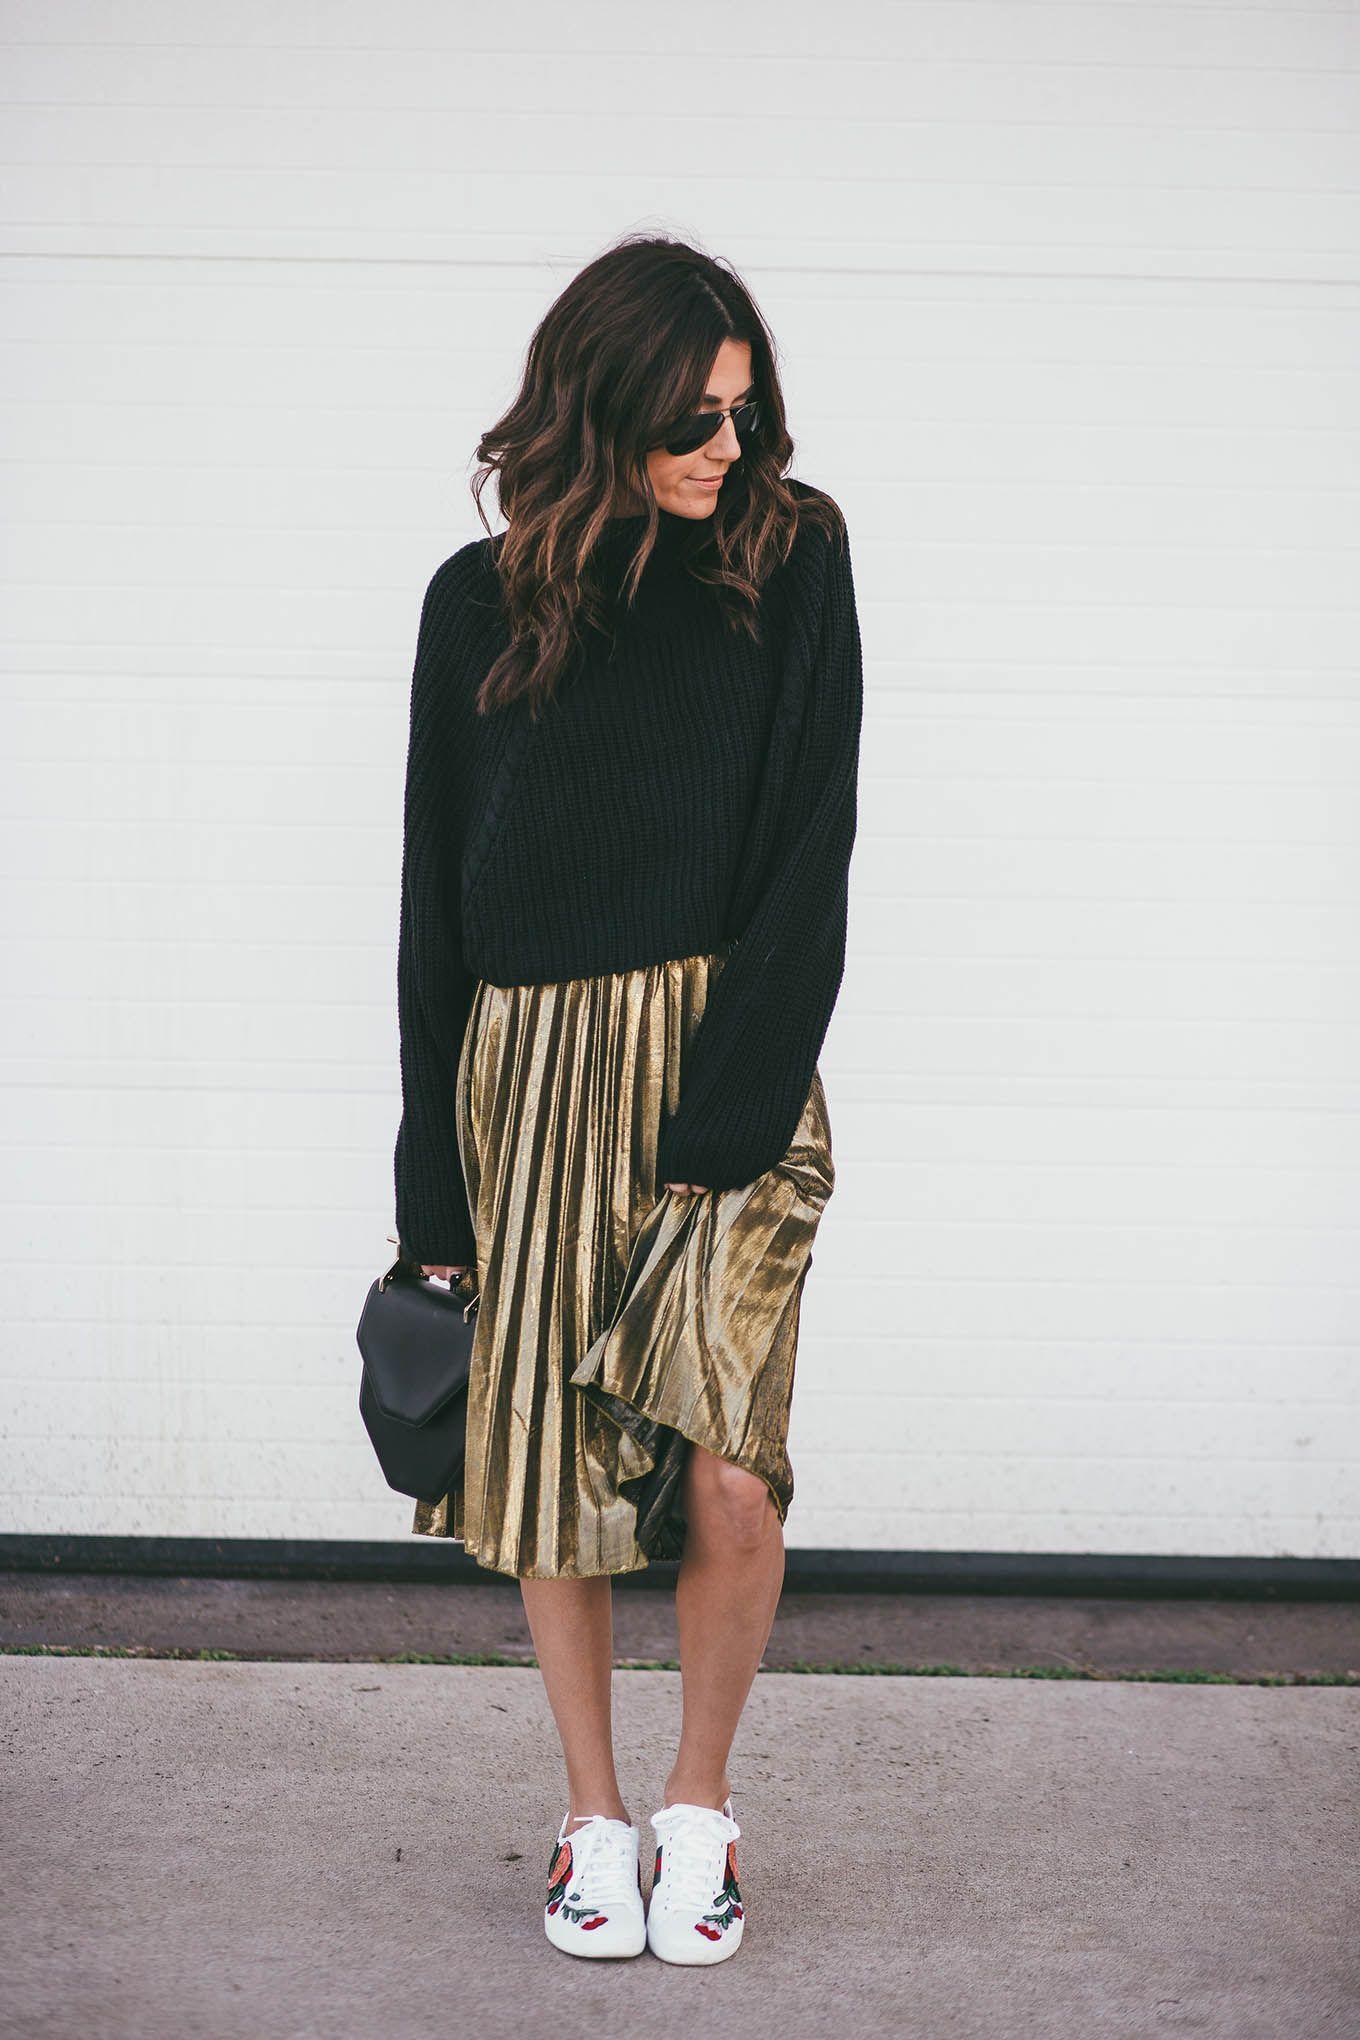 hello fashion dressy style | My Style | Pinterest | Winter ...